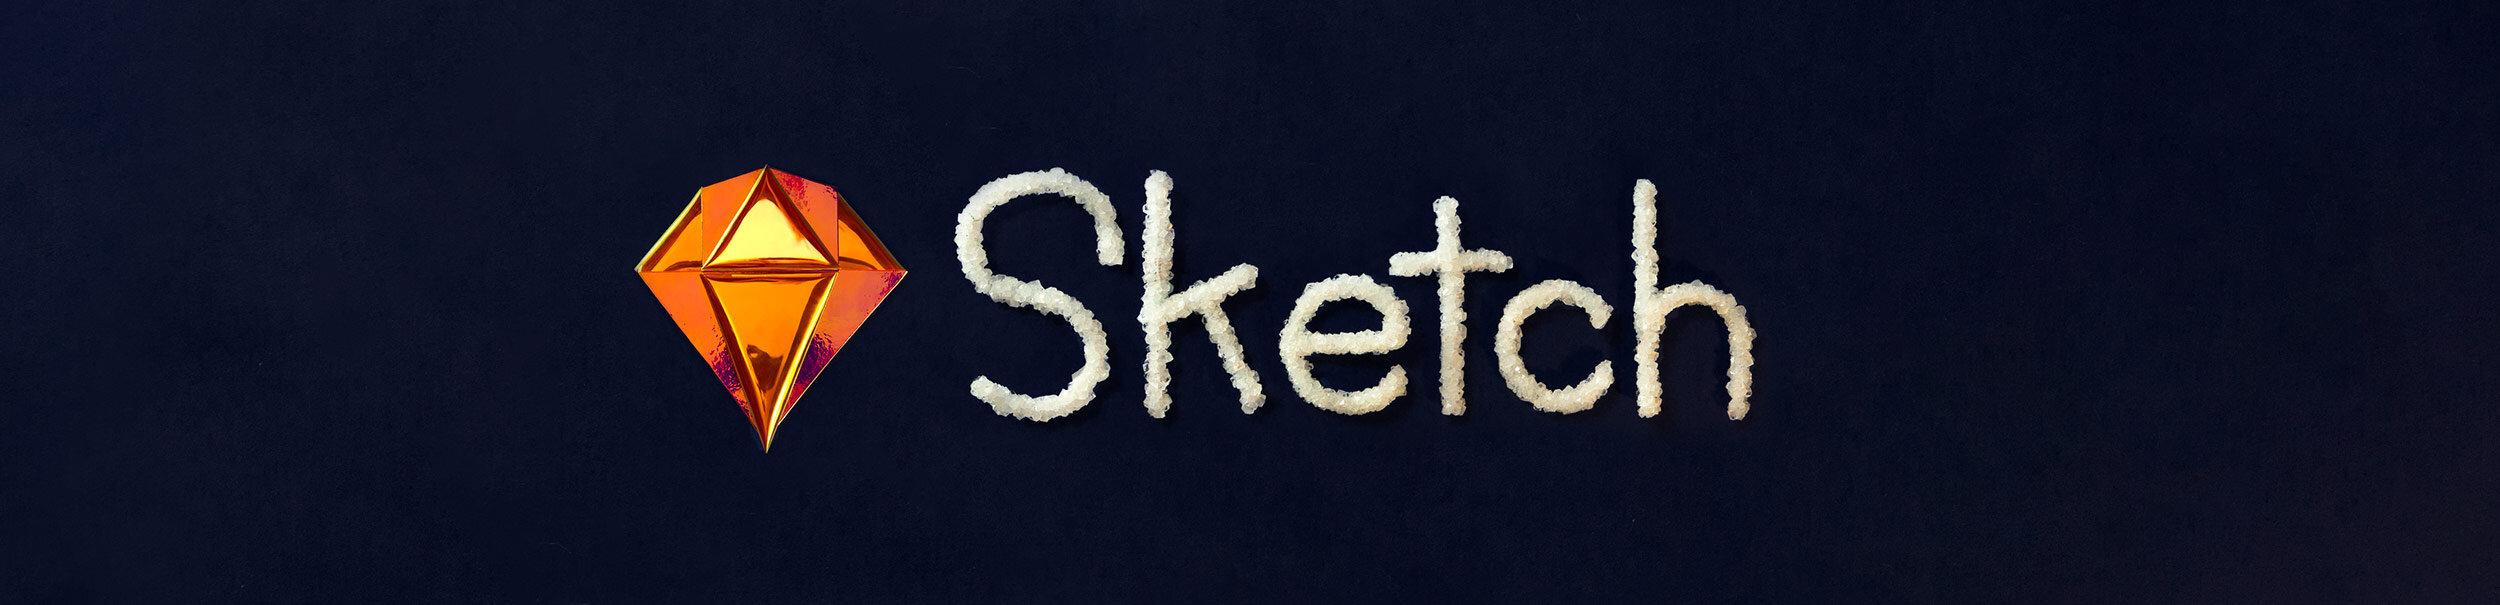 Sketch-logo-lockup.jpg